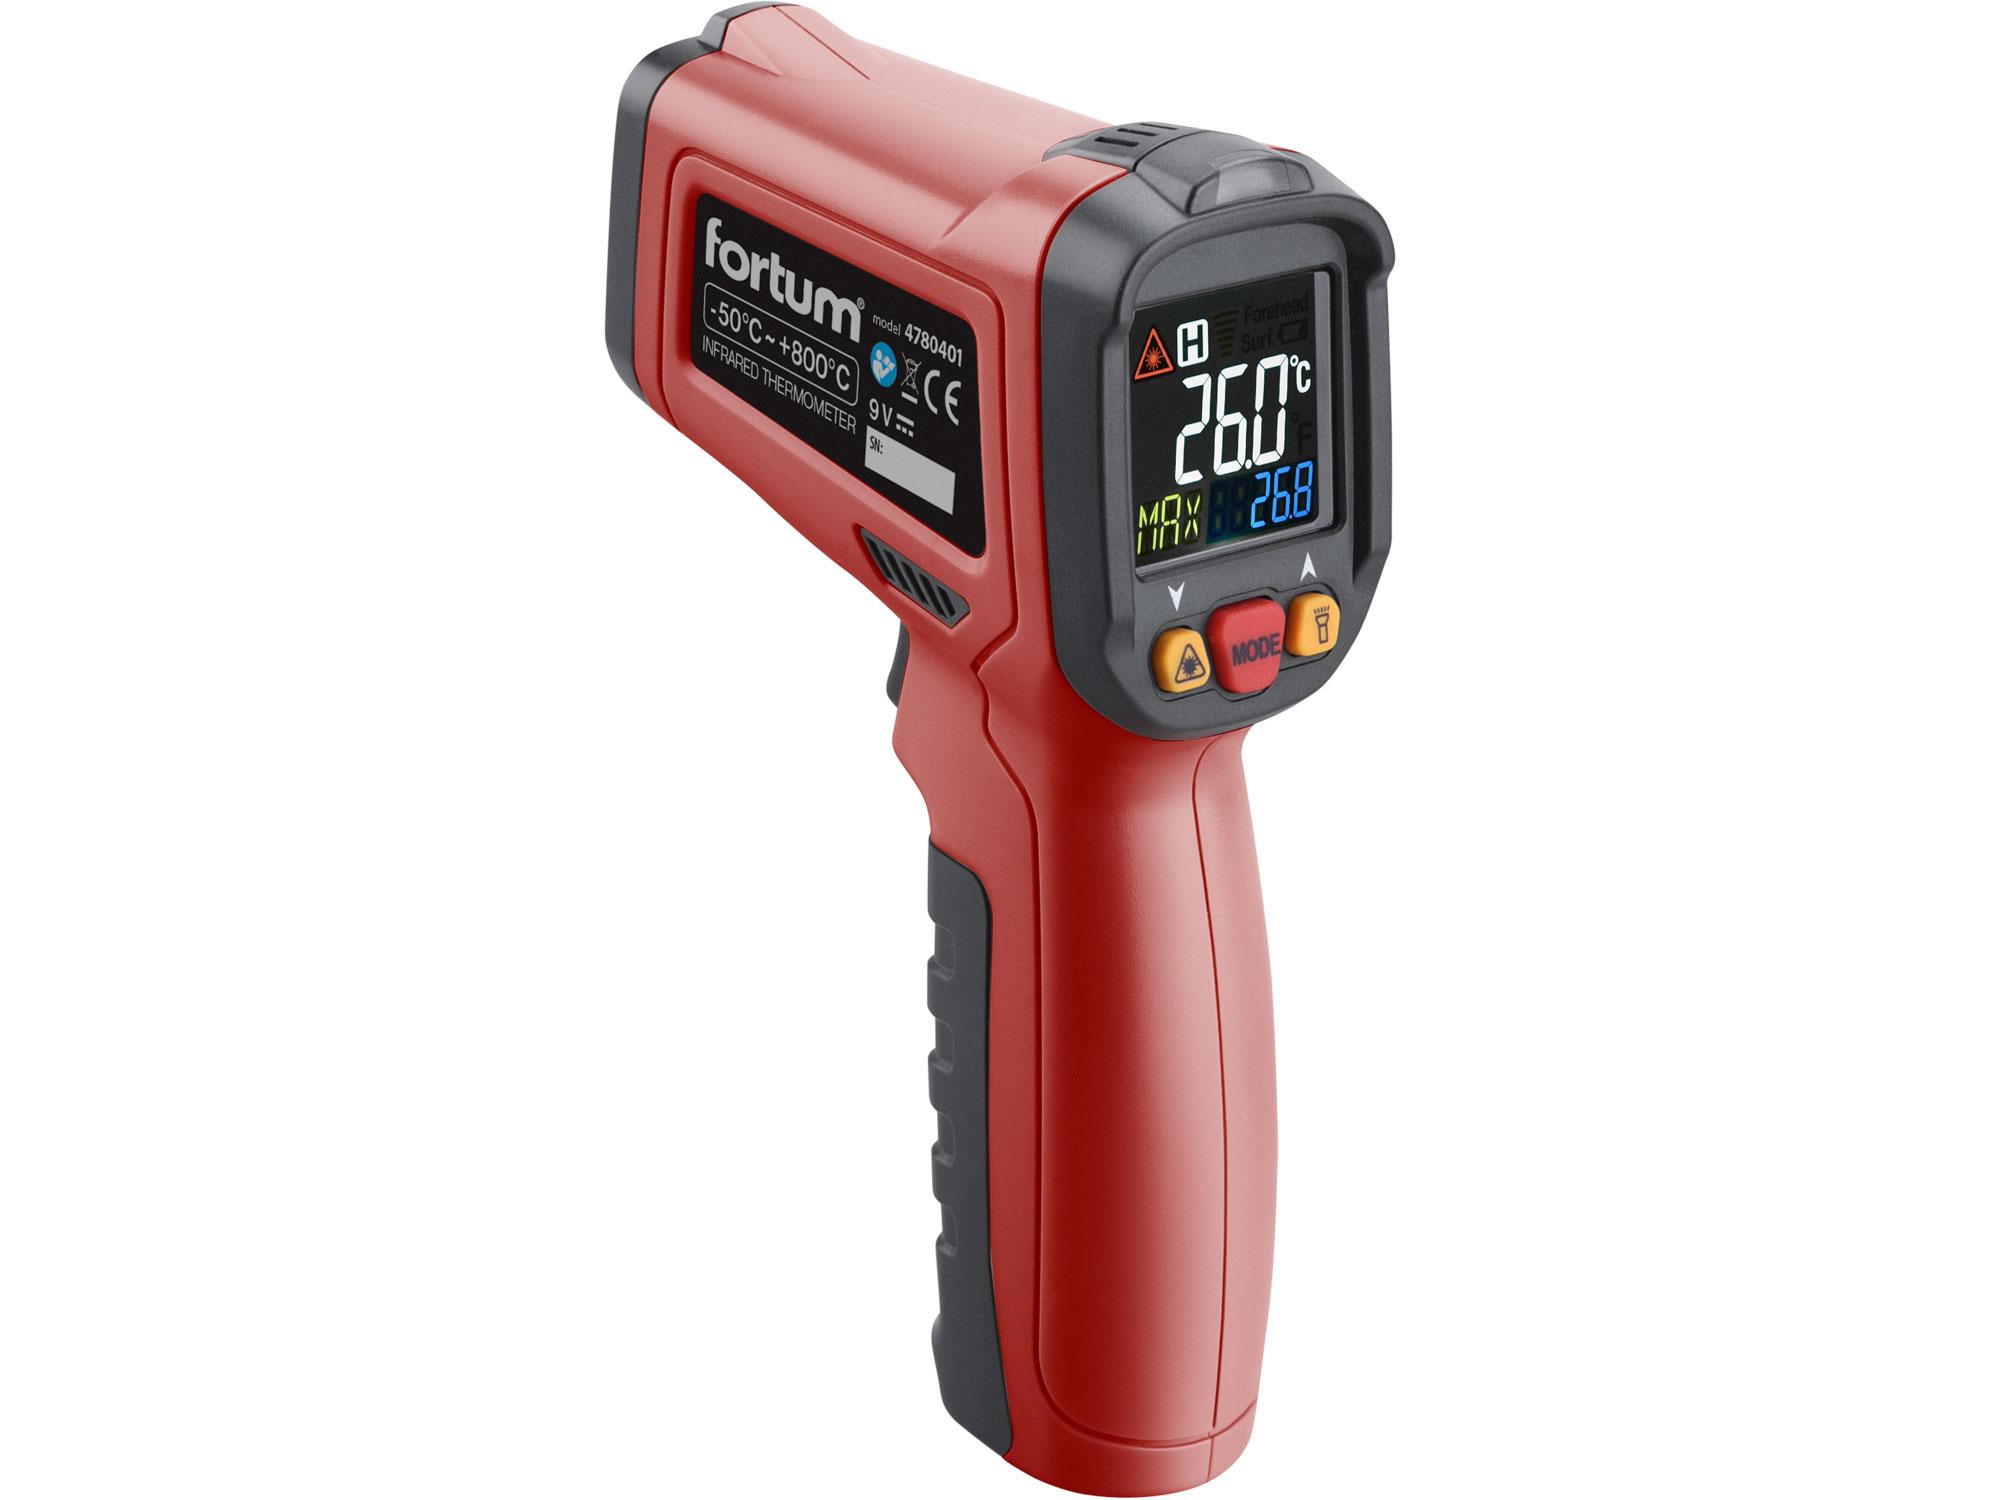 Infrarot Thermometer, kontaktlos, mit Sonde, -50°bis 800°C